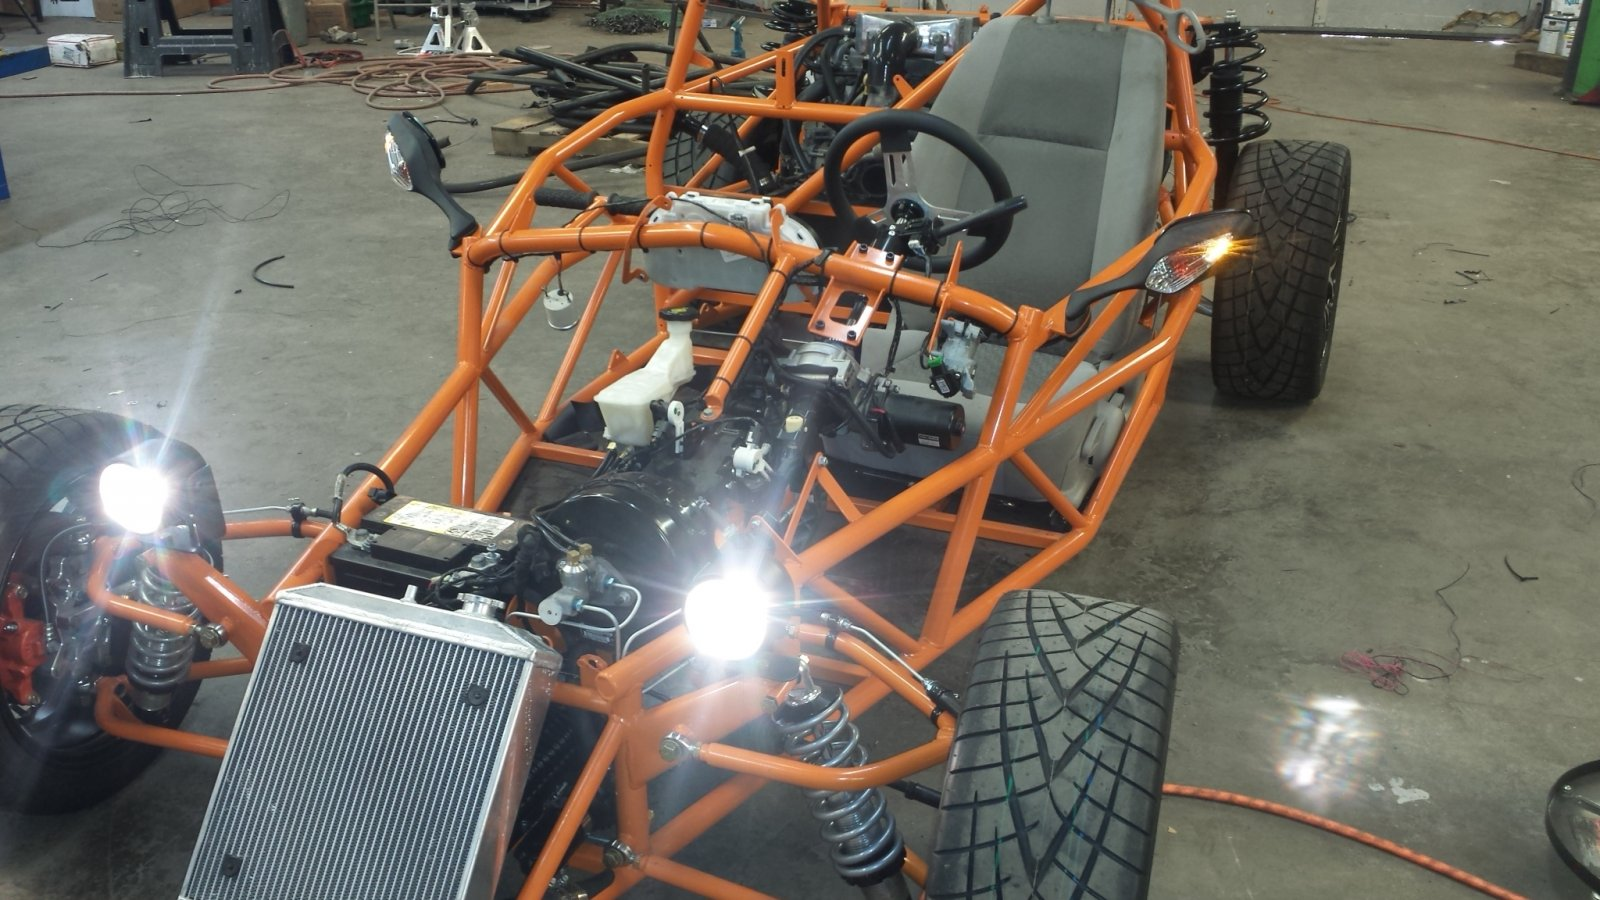 Goblin Kit Car 2019 2020 New Upcoming Cars By Mamassecretbakery Com